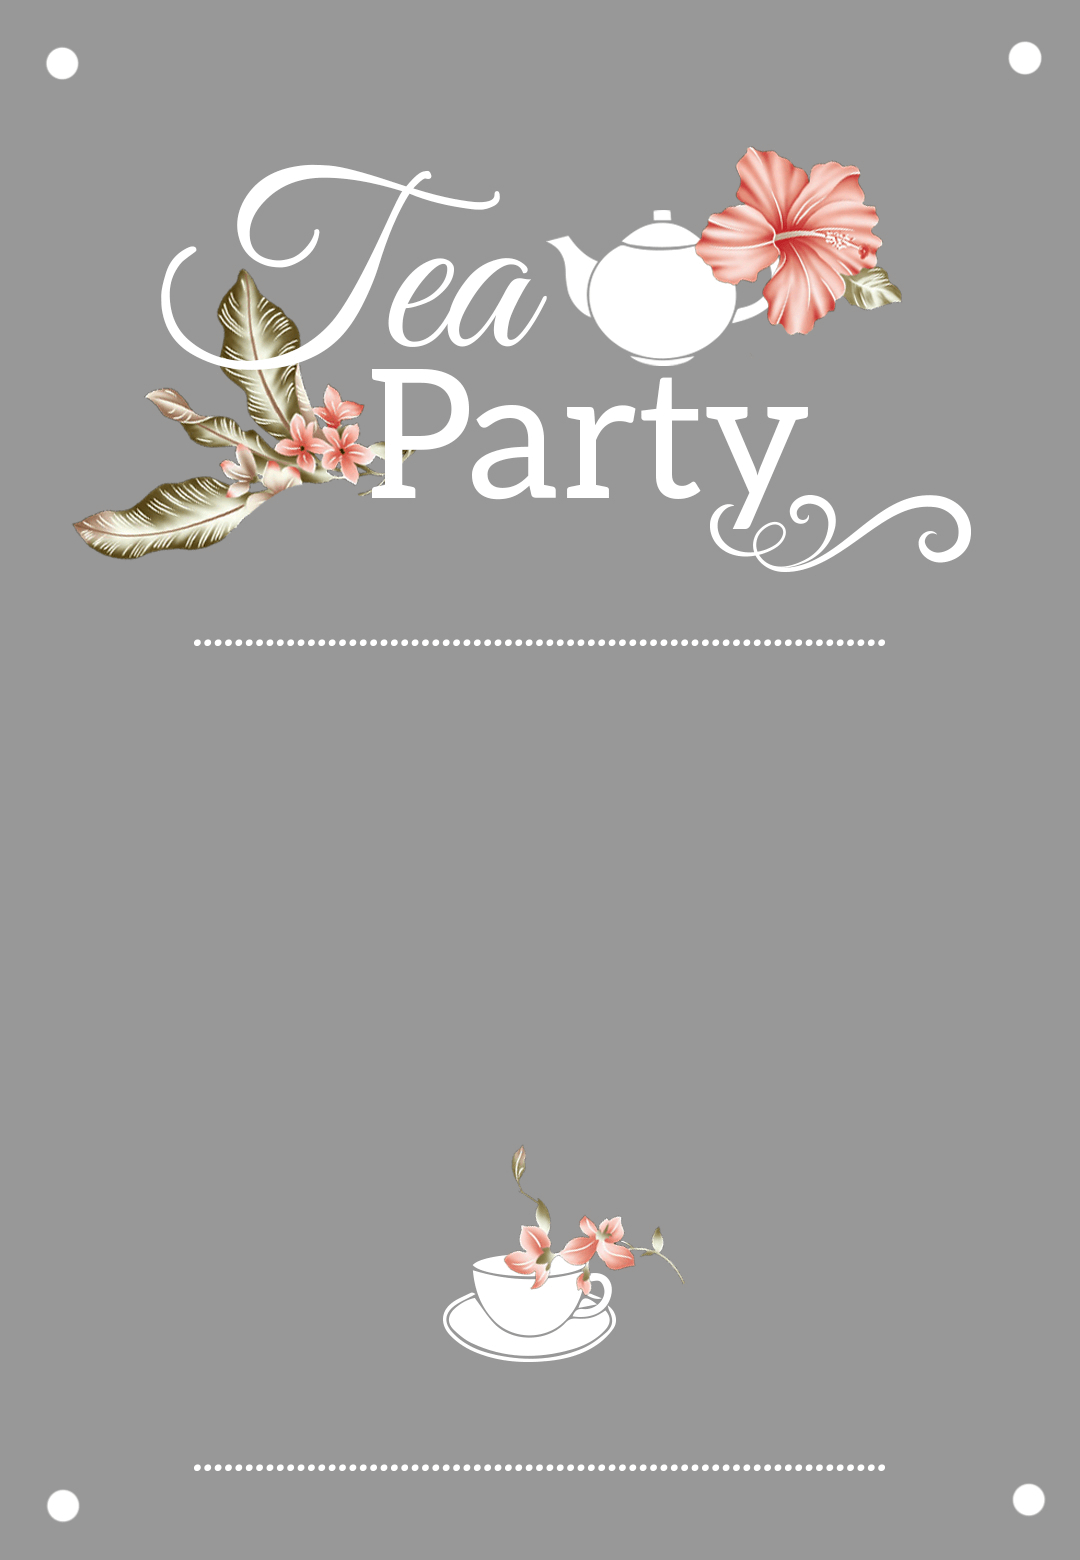 Bridal Shower Tea Party - Free Printable Bridal Shower Invitation - Free Printable Kitchen Tea Invitation Templates